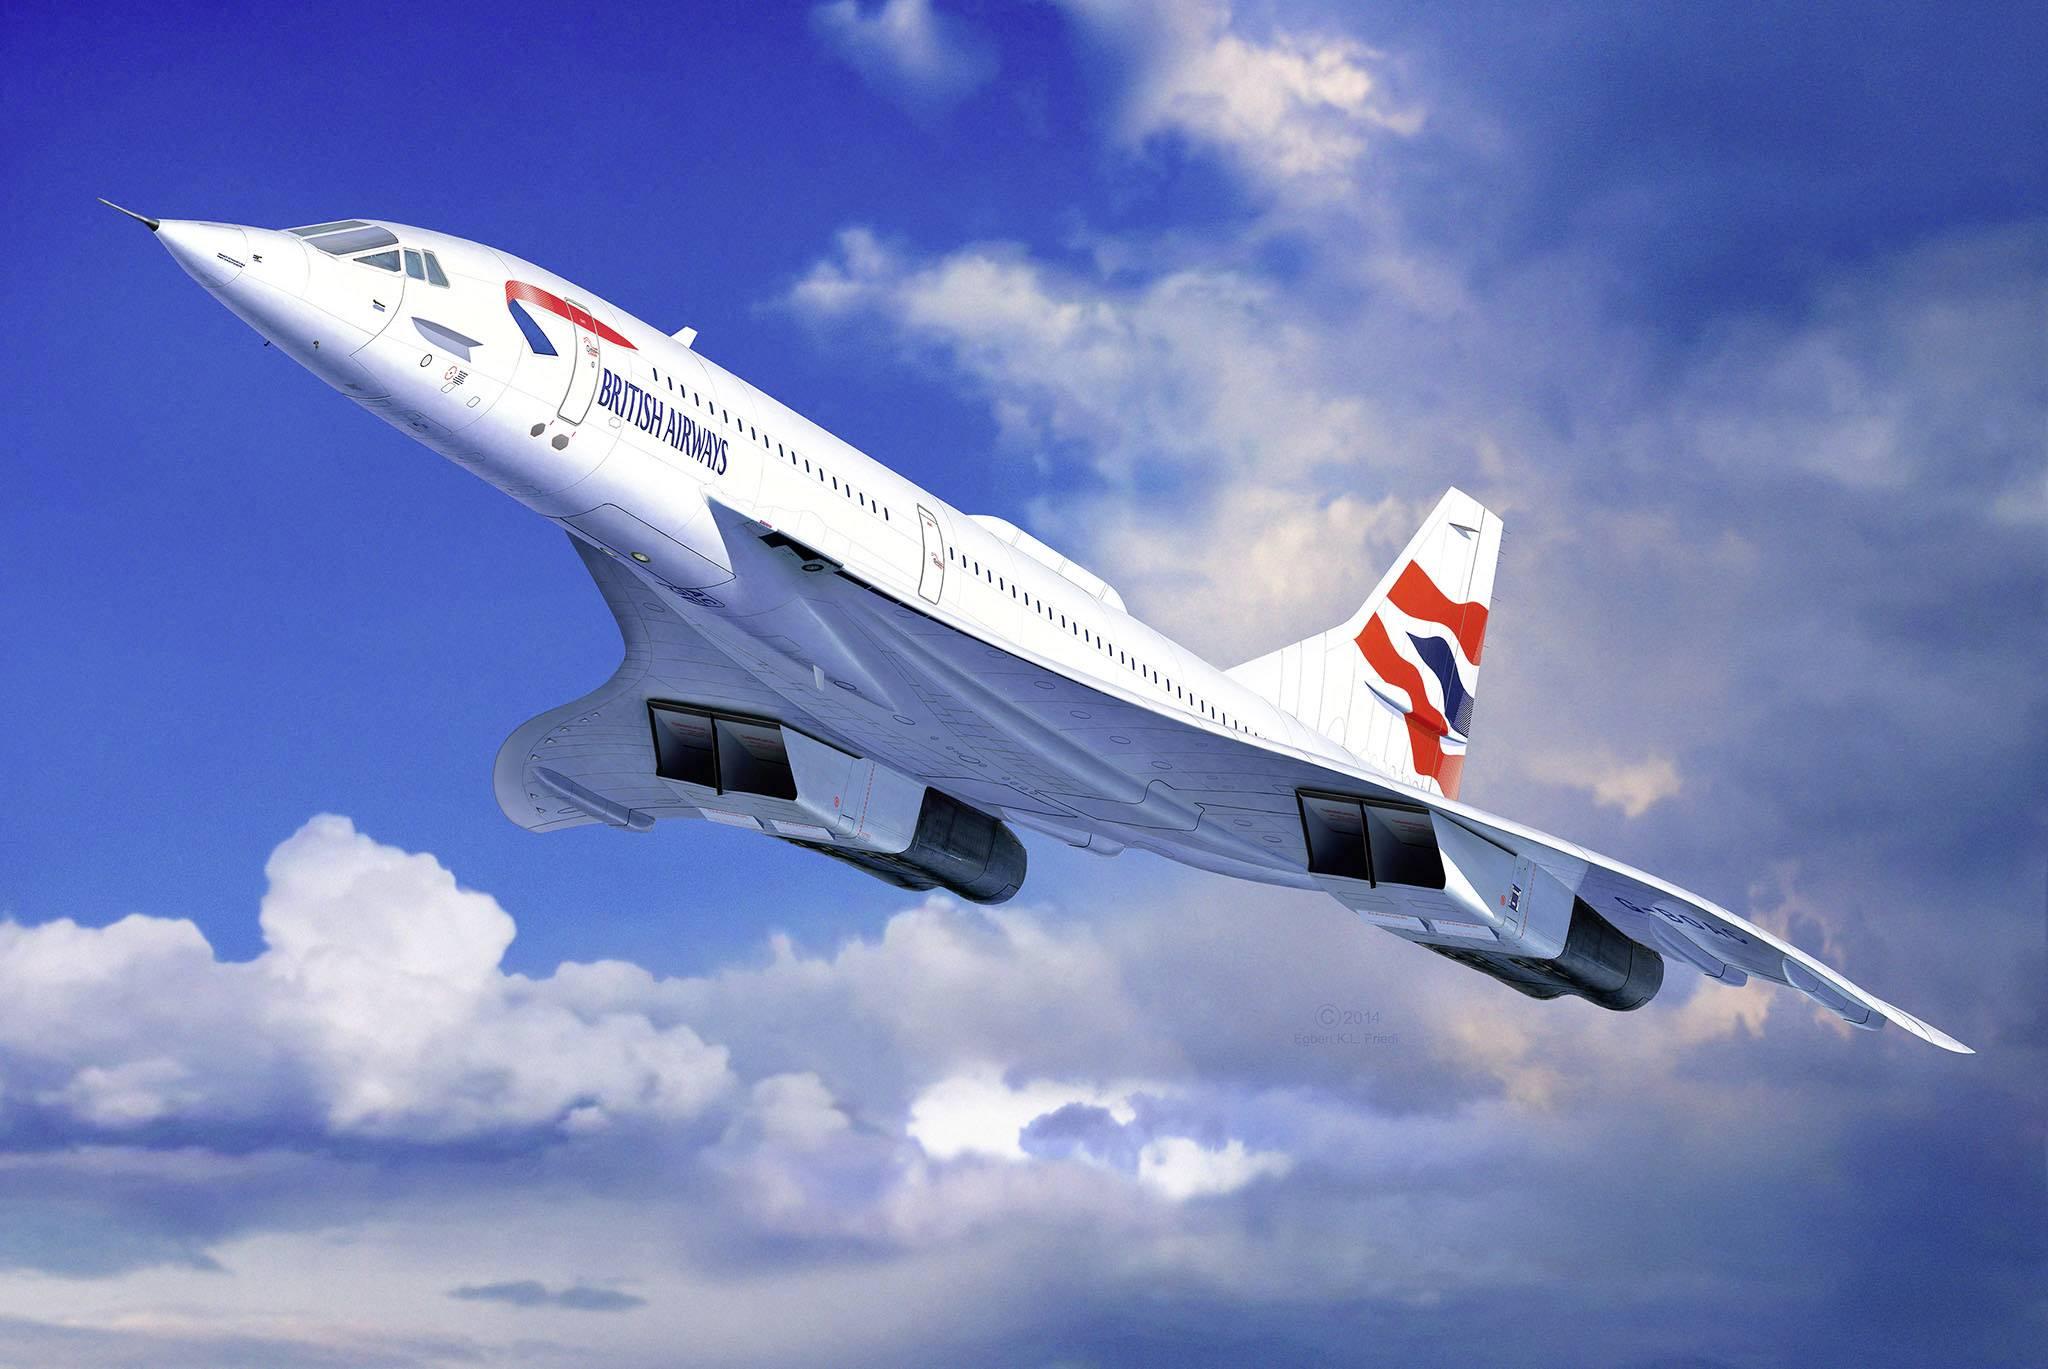 Model letadla, stavebnice Revell 4997 Concorde British Airways 1:72